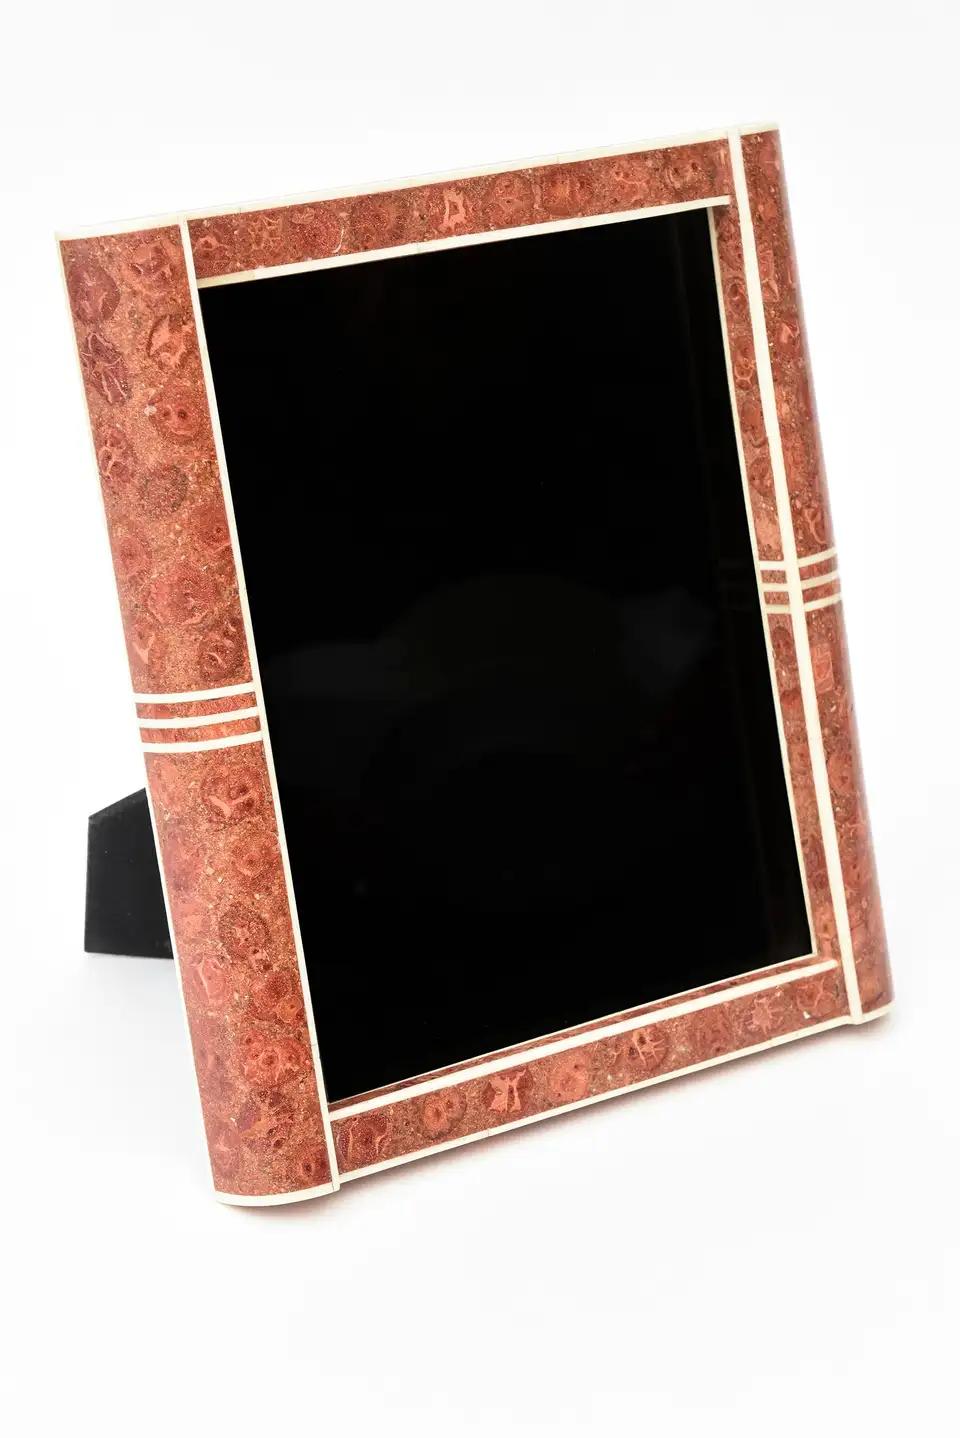 R Y Augousti Style Stone Picture Frame Vintage In 2020 Stone Pictures Picture Frames Frame